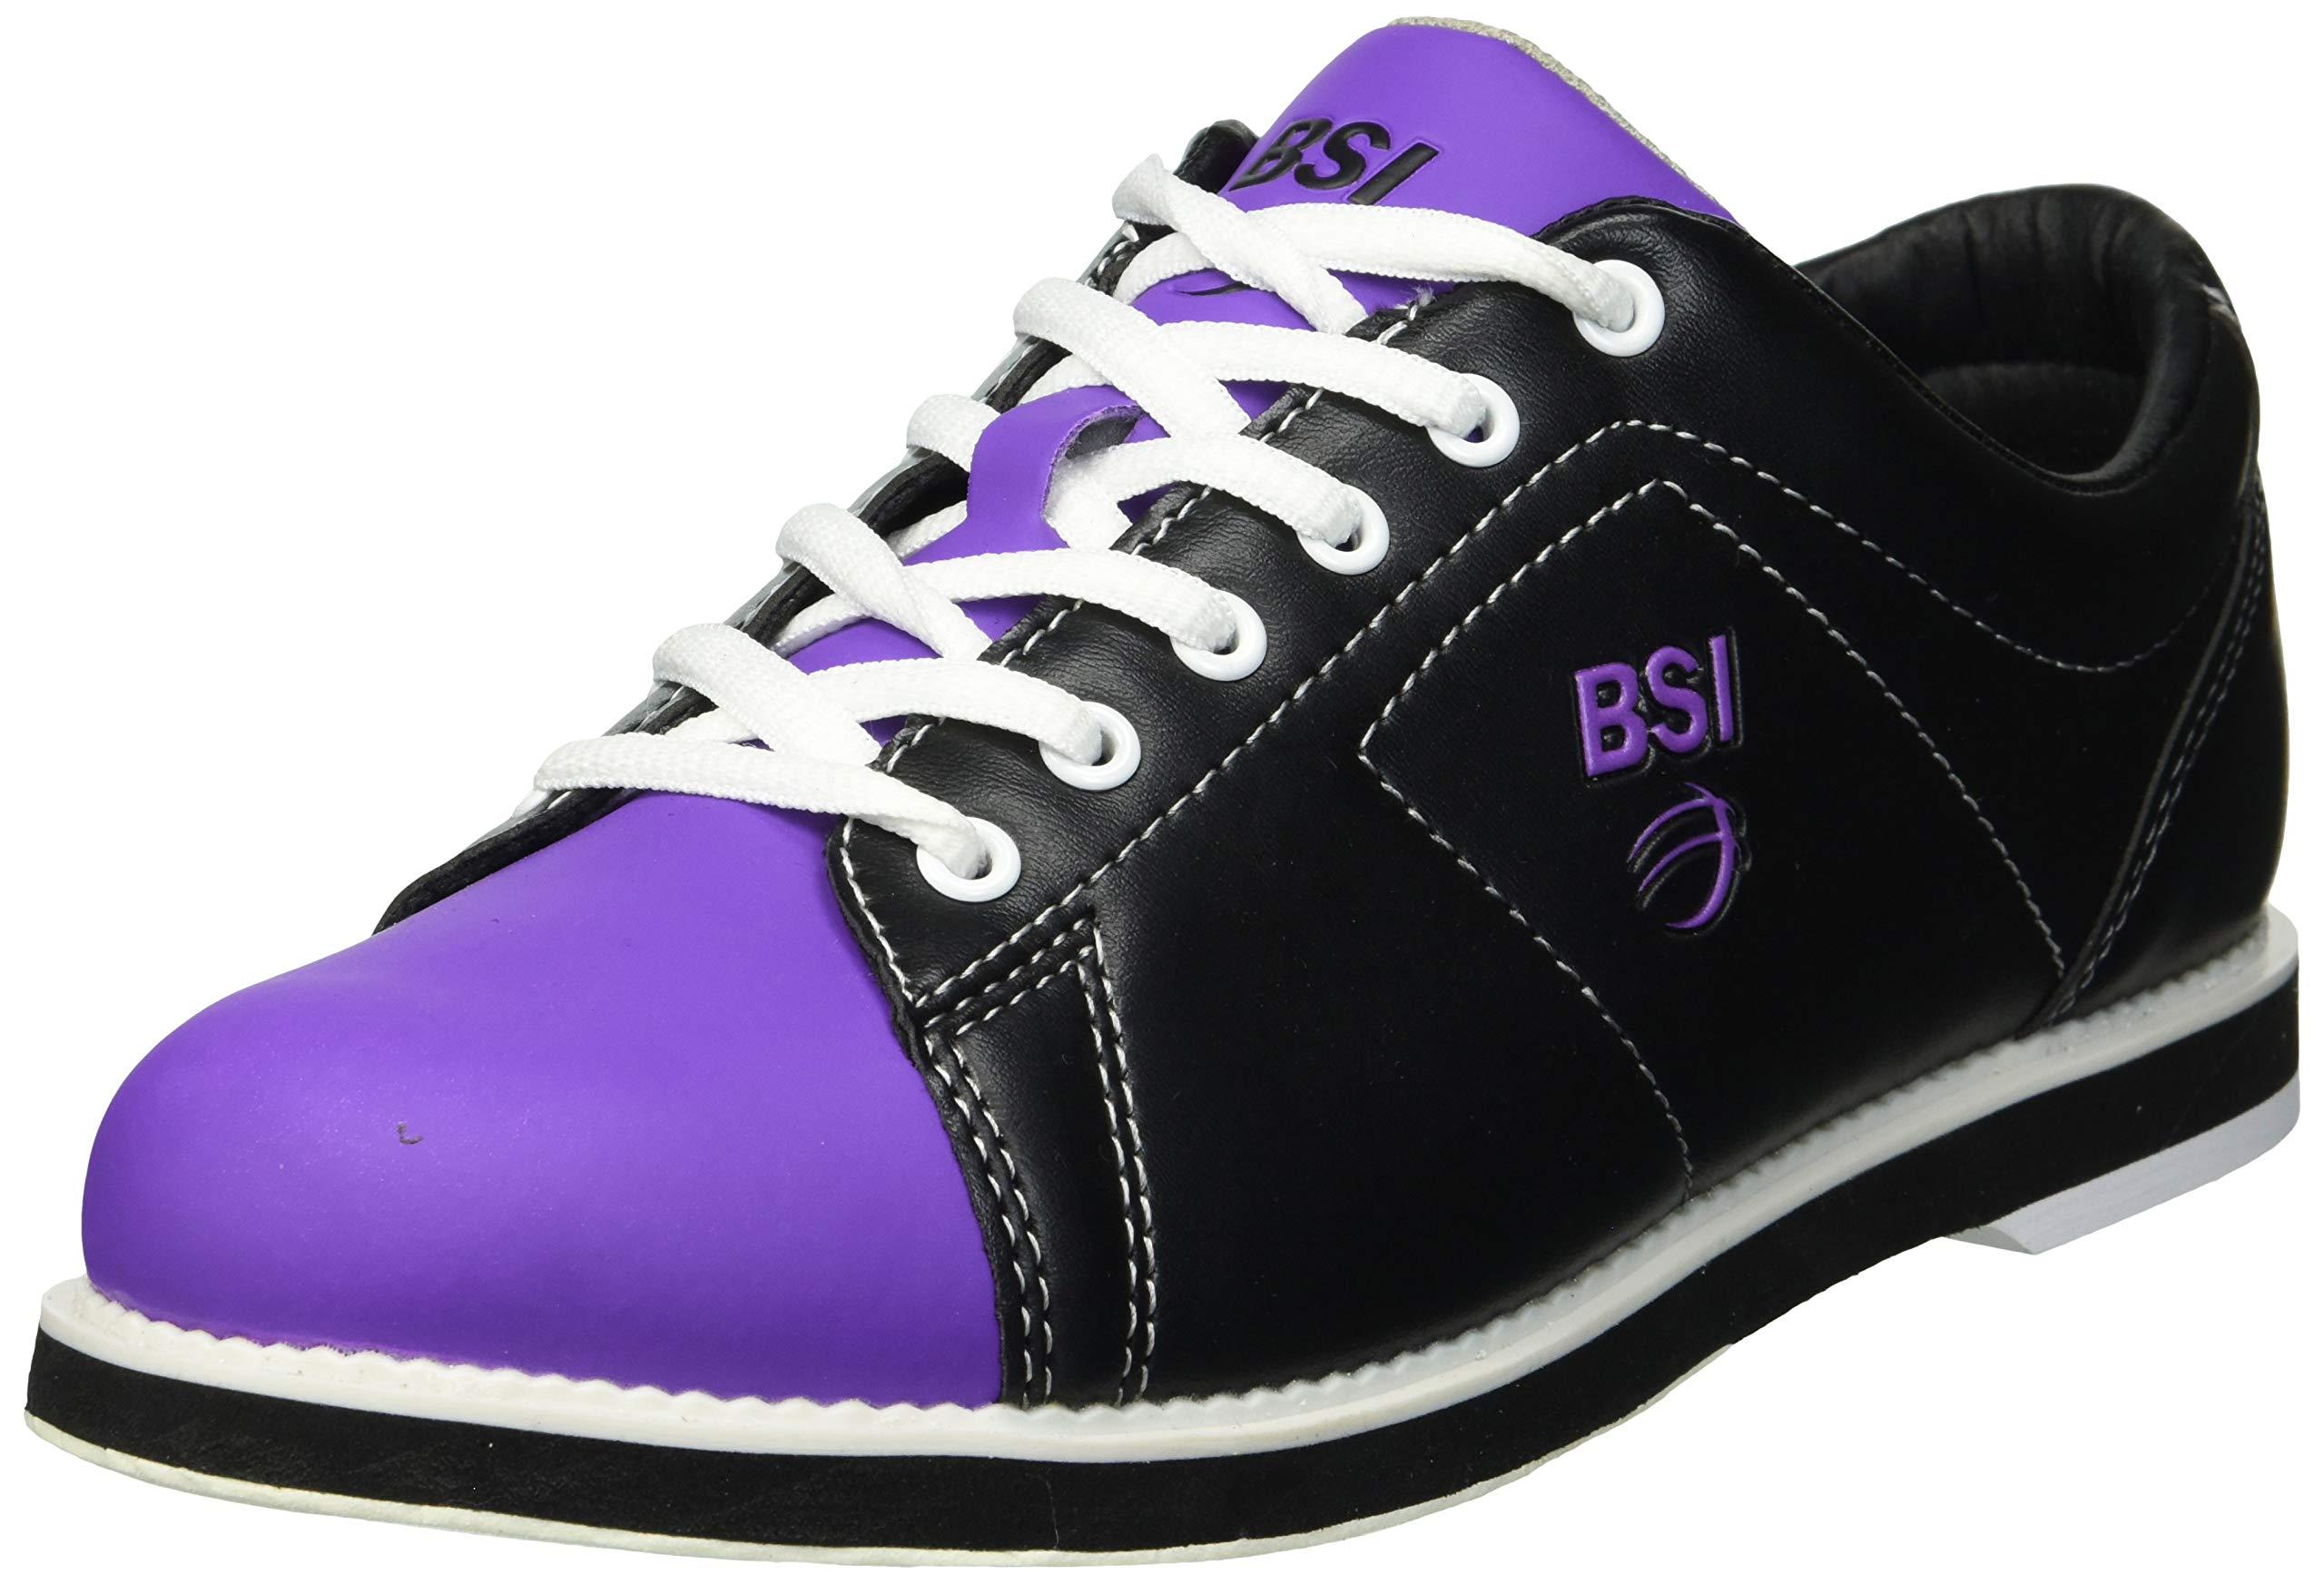 BSI 654 Women's Classic #654, Black/Purple, 6.0 by BSI